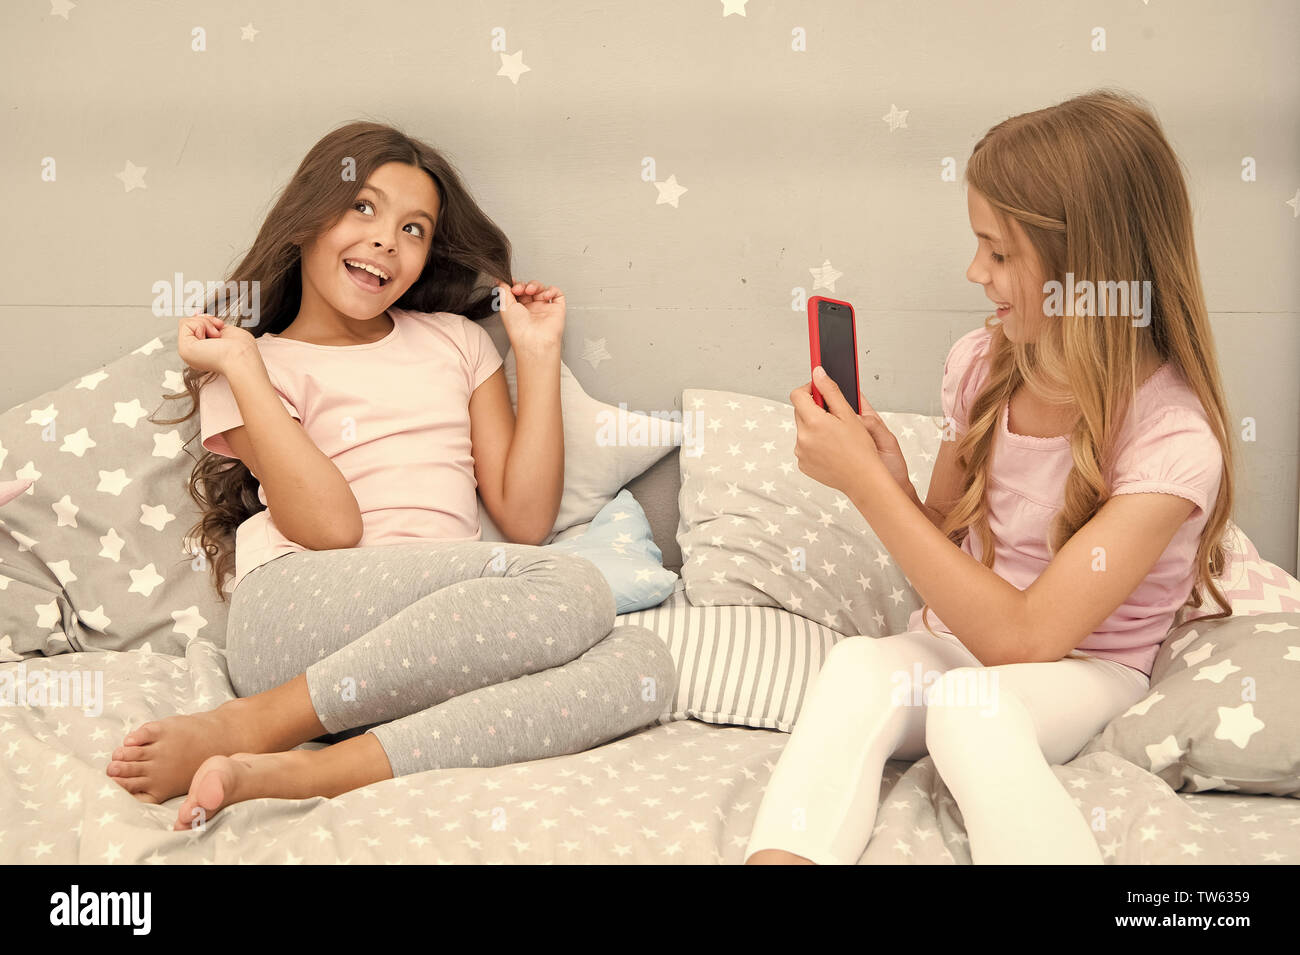 Girlish leisure pajama party. Girls smartphone posing great shot. Send photo social network using smartphone. Smartphone for entertainment. Kids takin - Stock Image